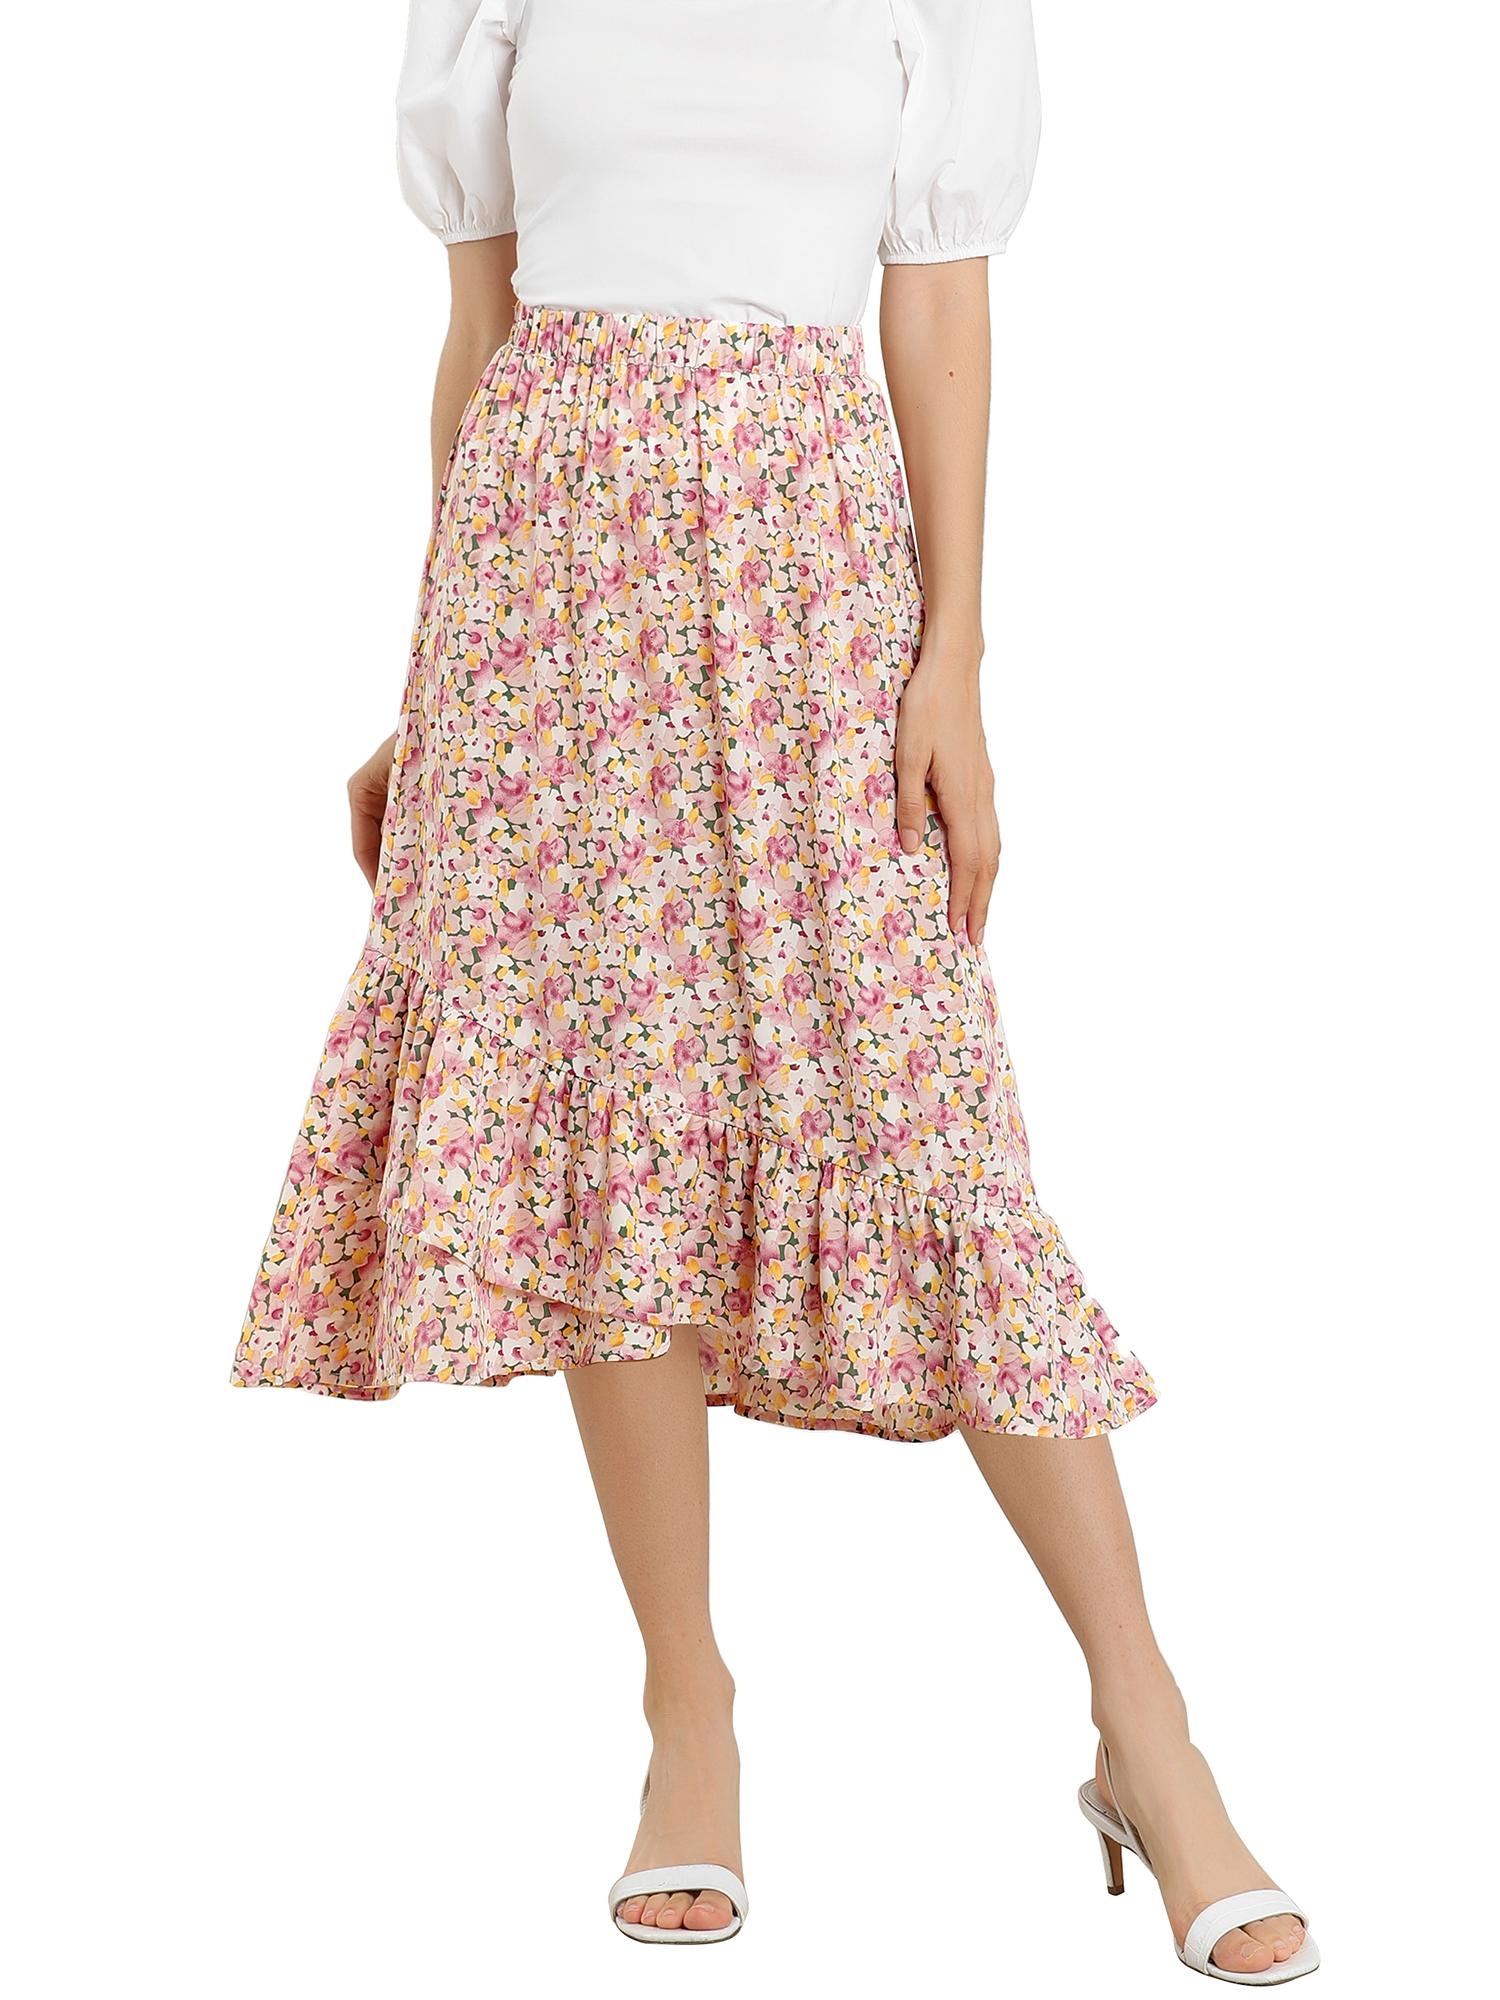 Women's Floral Fall Elastic Waist Ruffle High Low Hem Vintage Skirt Pink XS